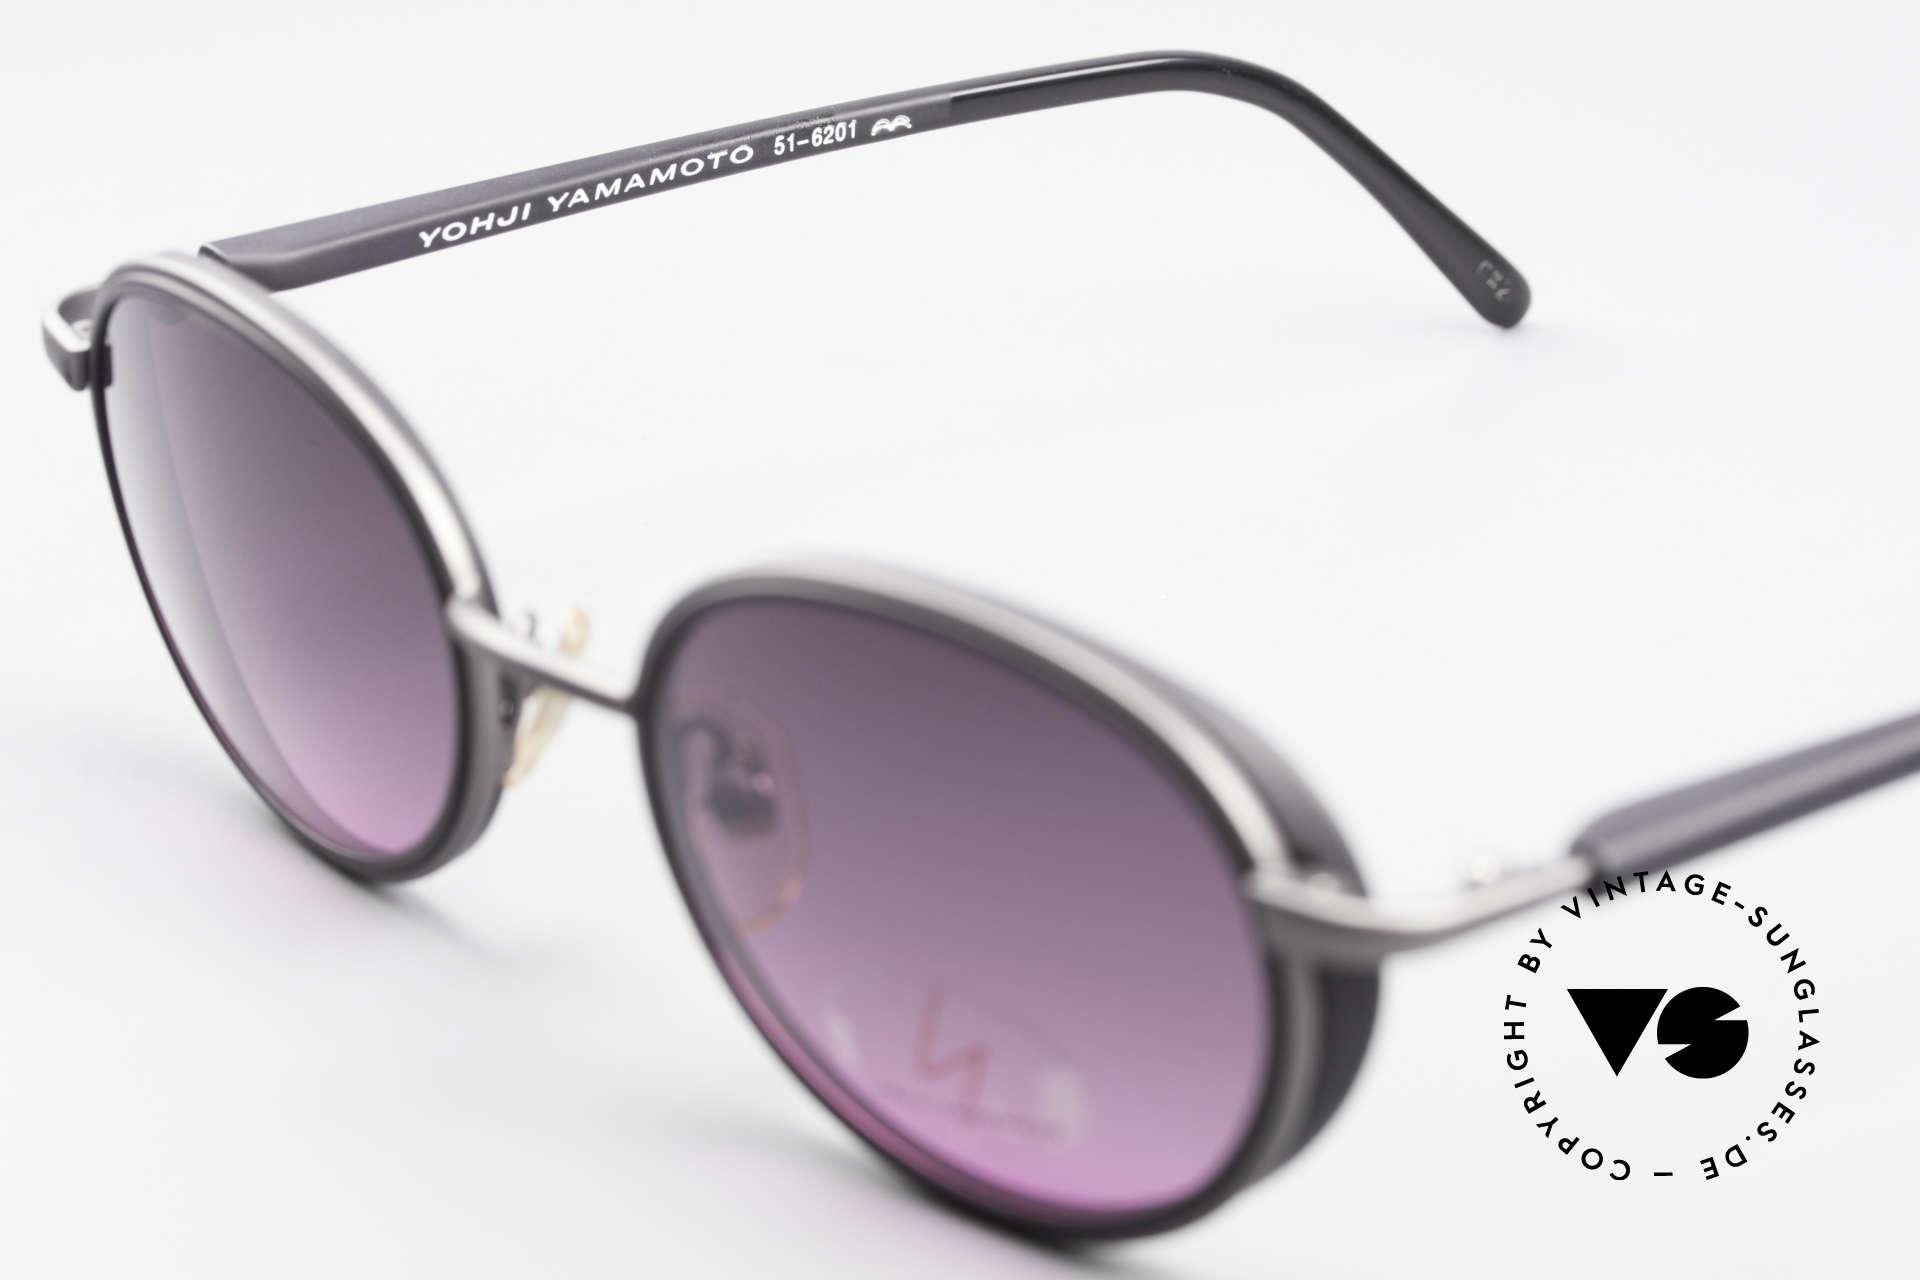 Yohji Yamamoto 51-6201 Side Shields Sunglasses 90's, NO RETRO shades, but a Yamamoto ORIGINAL from 1995, Made for Women